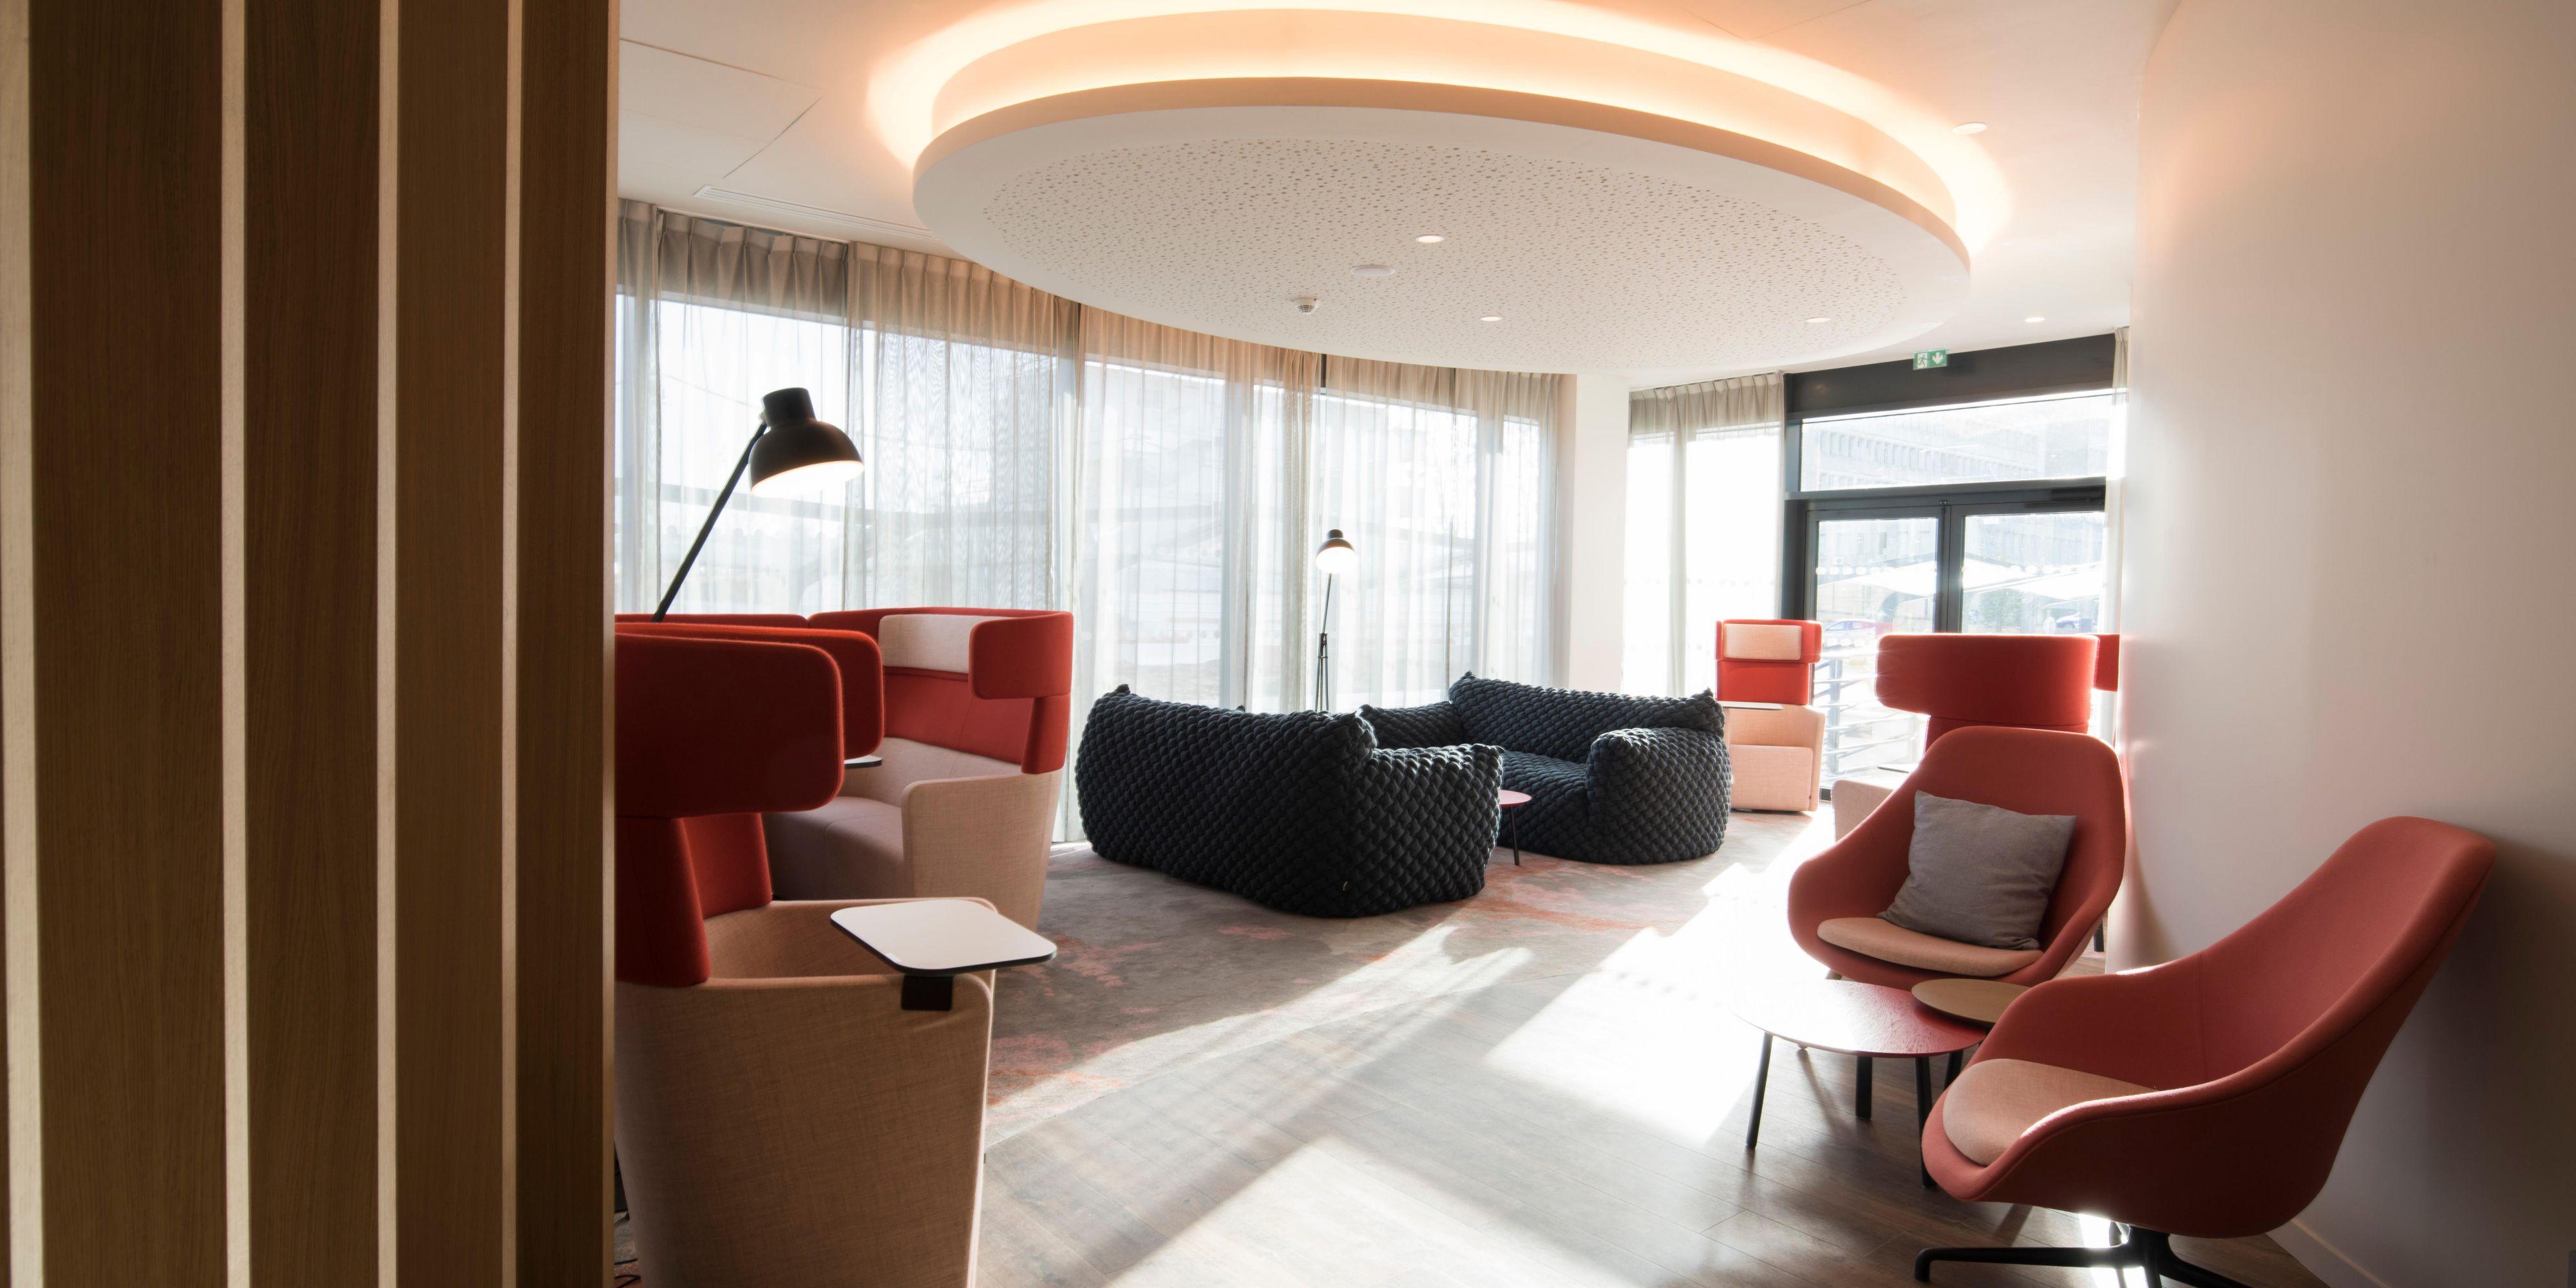 convertible de france avis simple ford mustang gt v convertible essai sur le pouce with. Black Bedroom Furniture Sets. Home Design Ideas